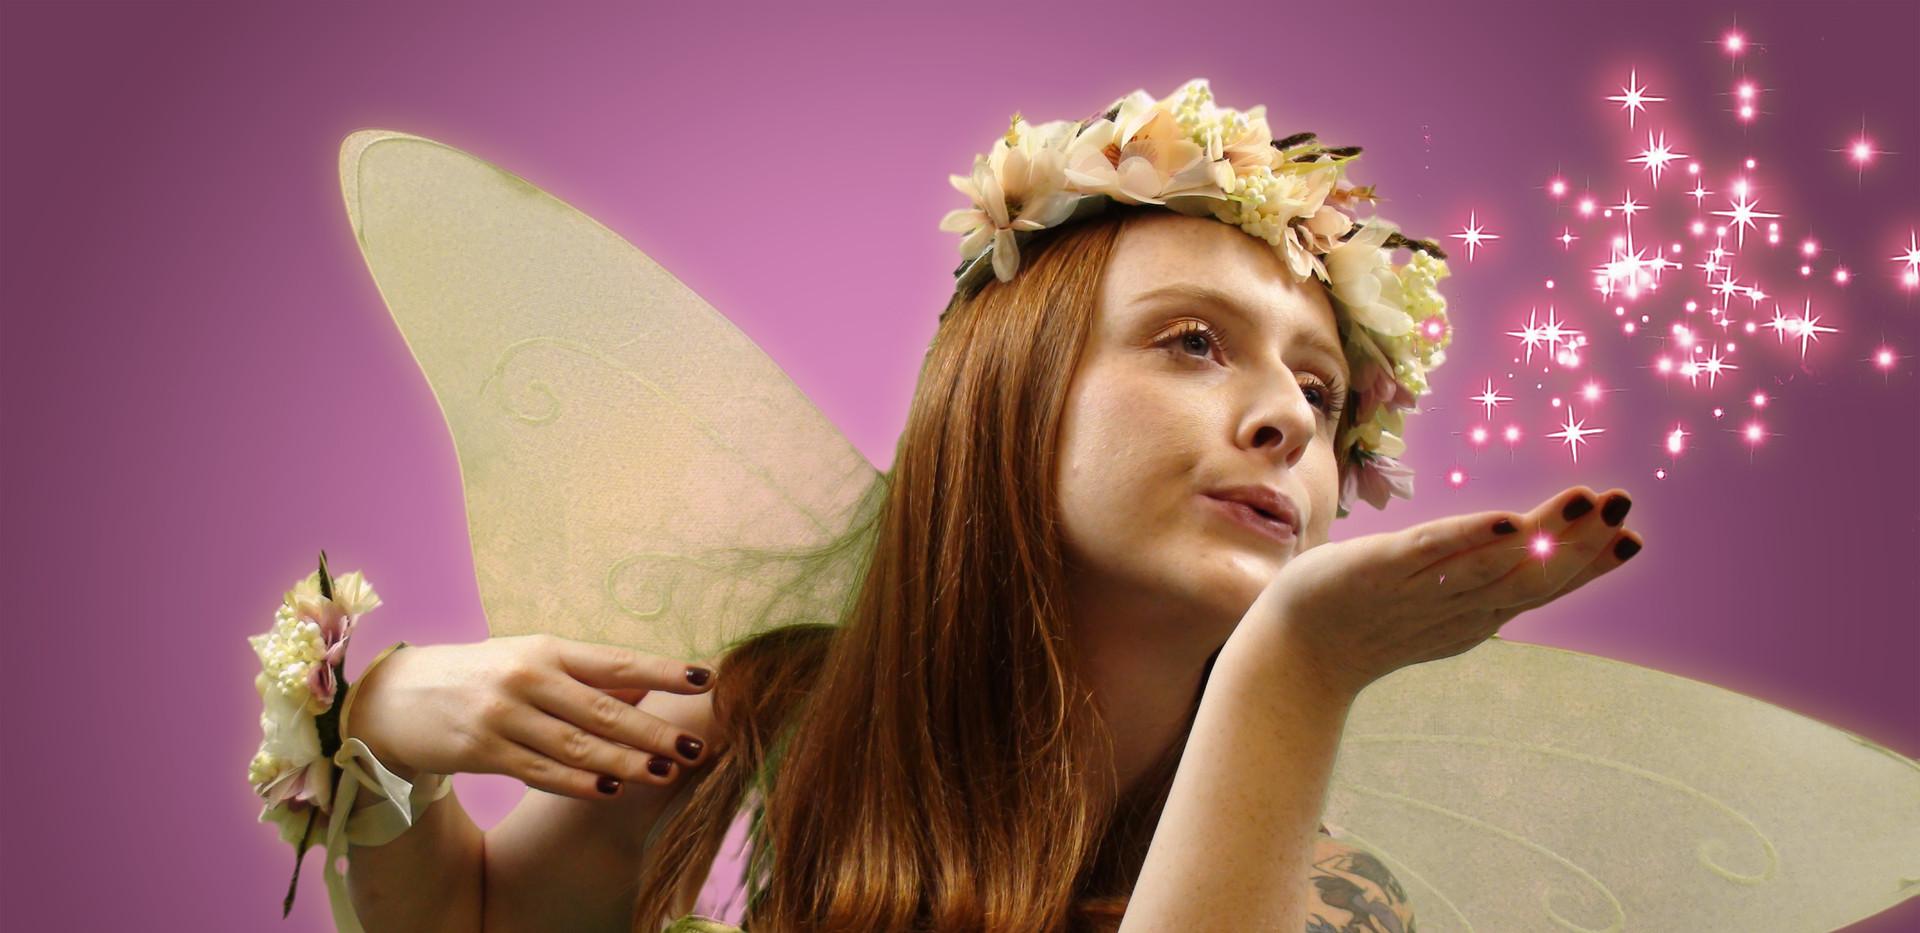 fairy_tess4.jpg